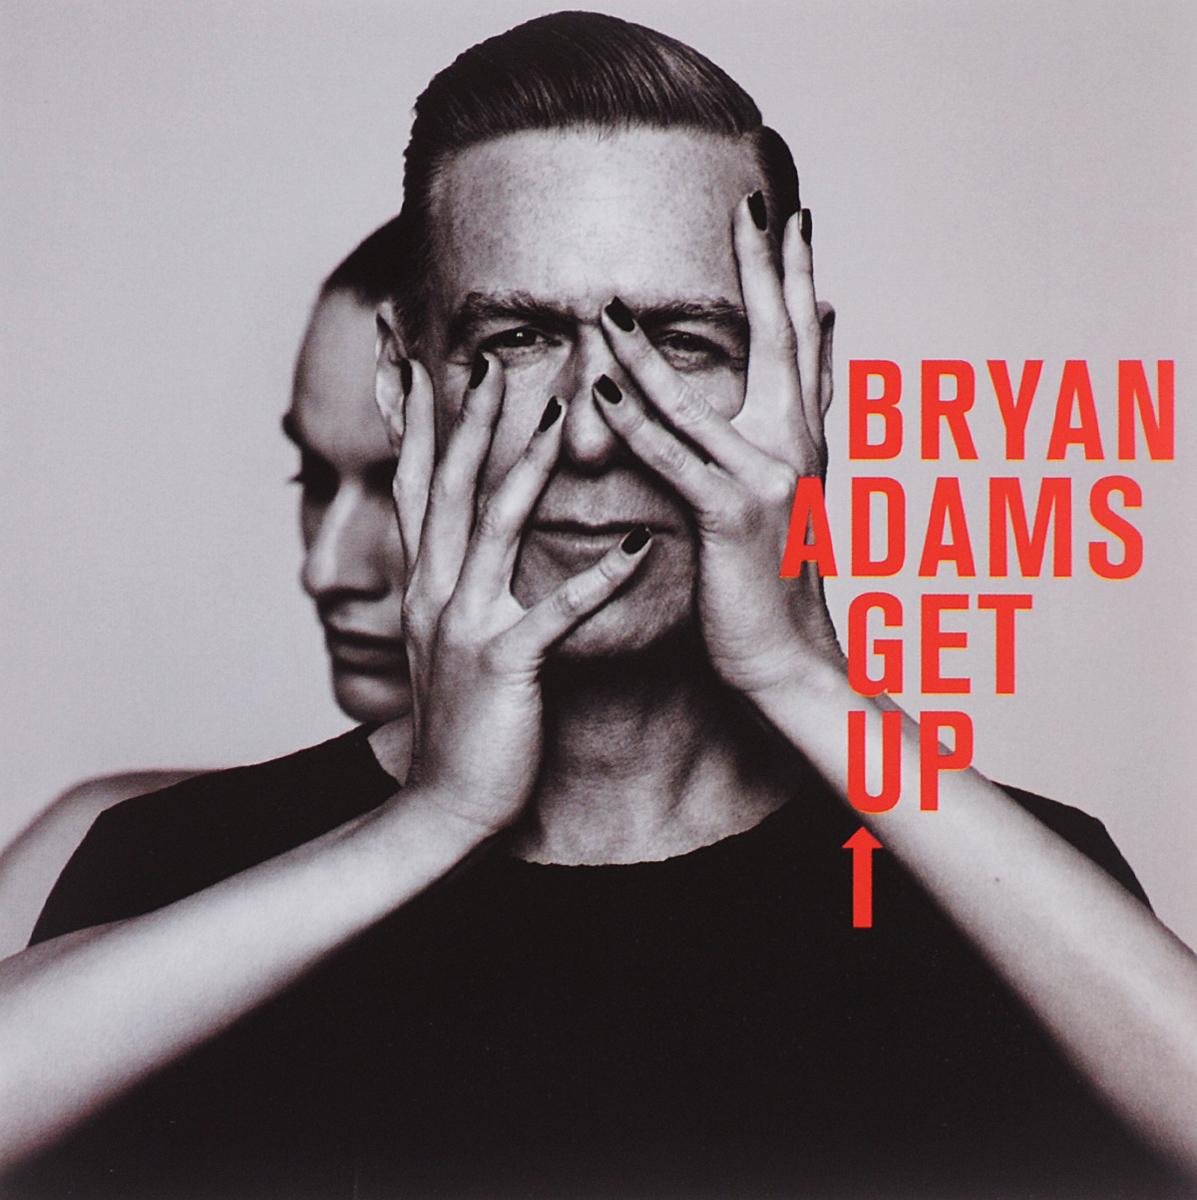 Брайан Адамс Bryan Adams. Get Up адамс дж том дик и дебби харри